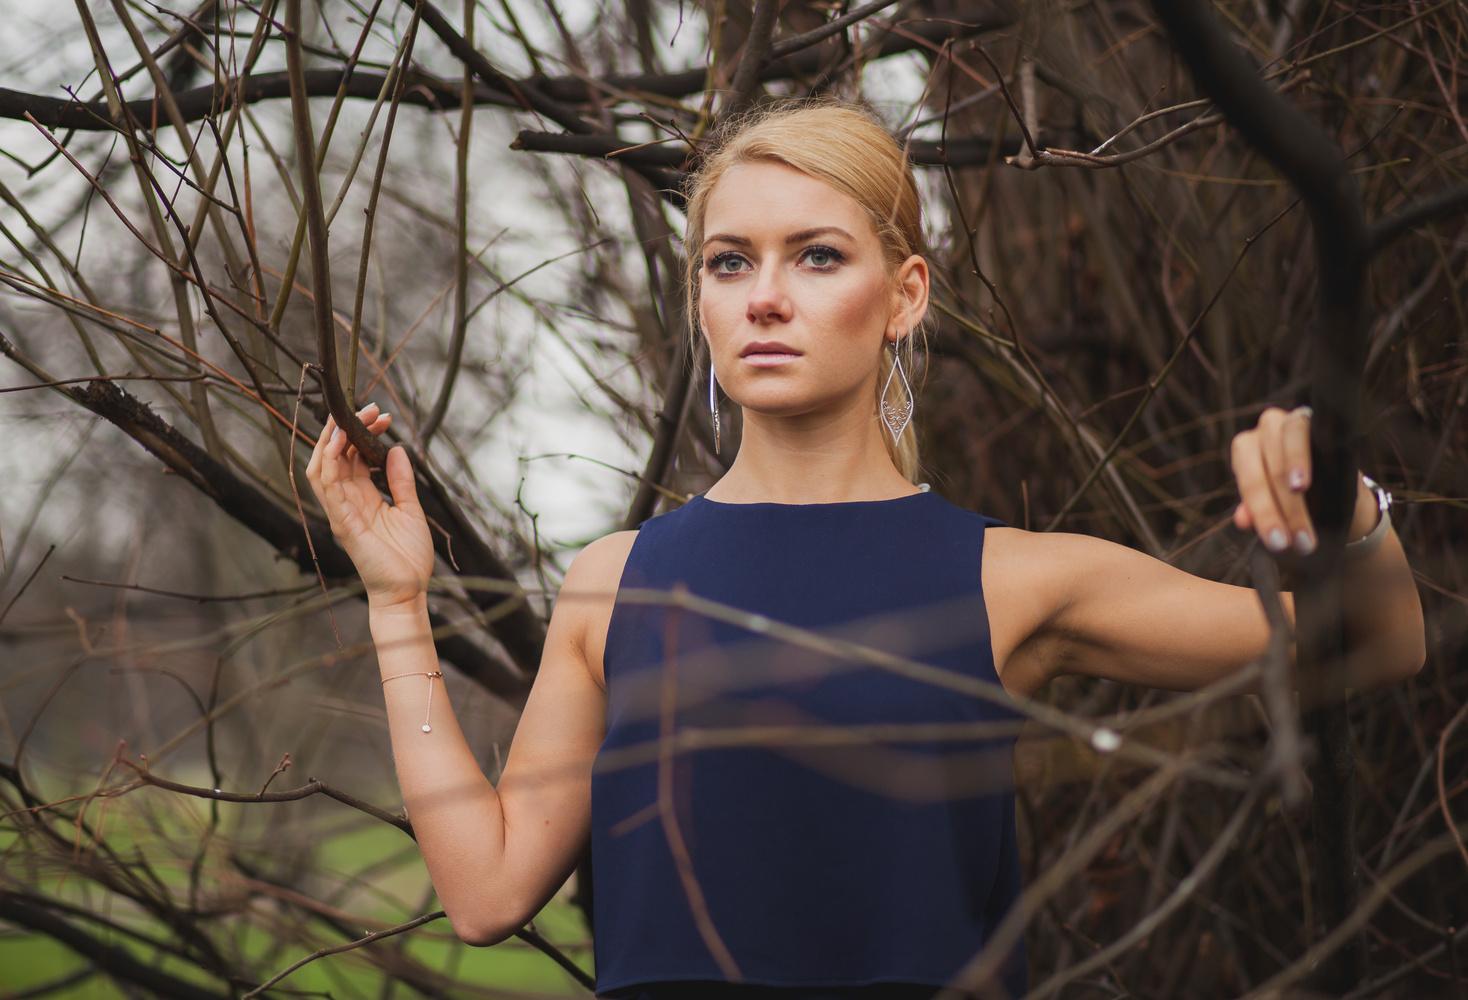 Beauty shoot by Aniko Portrait Photography